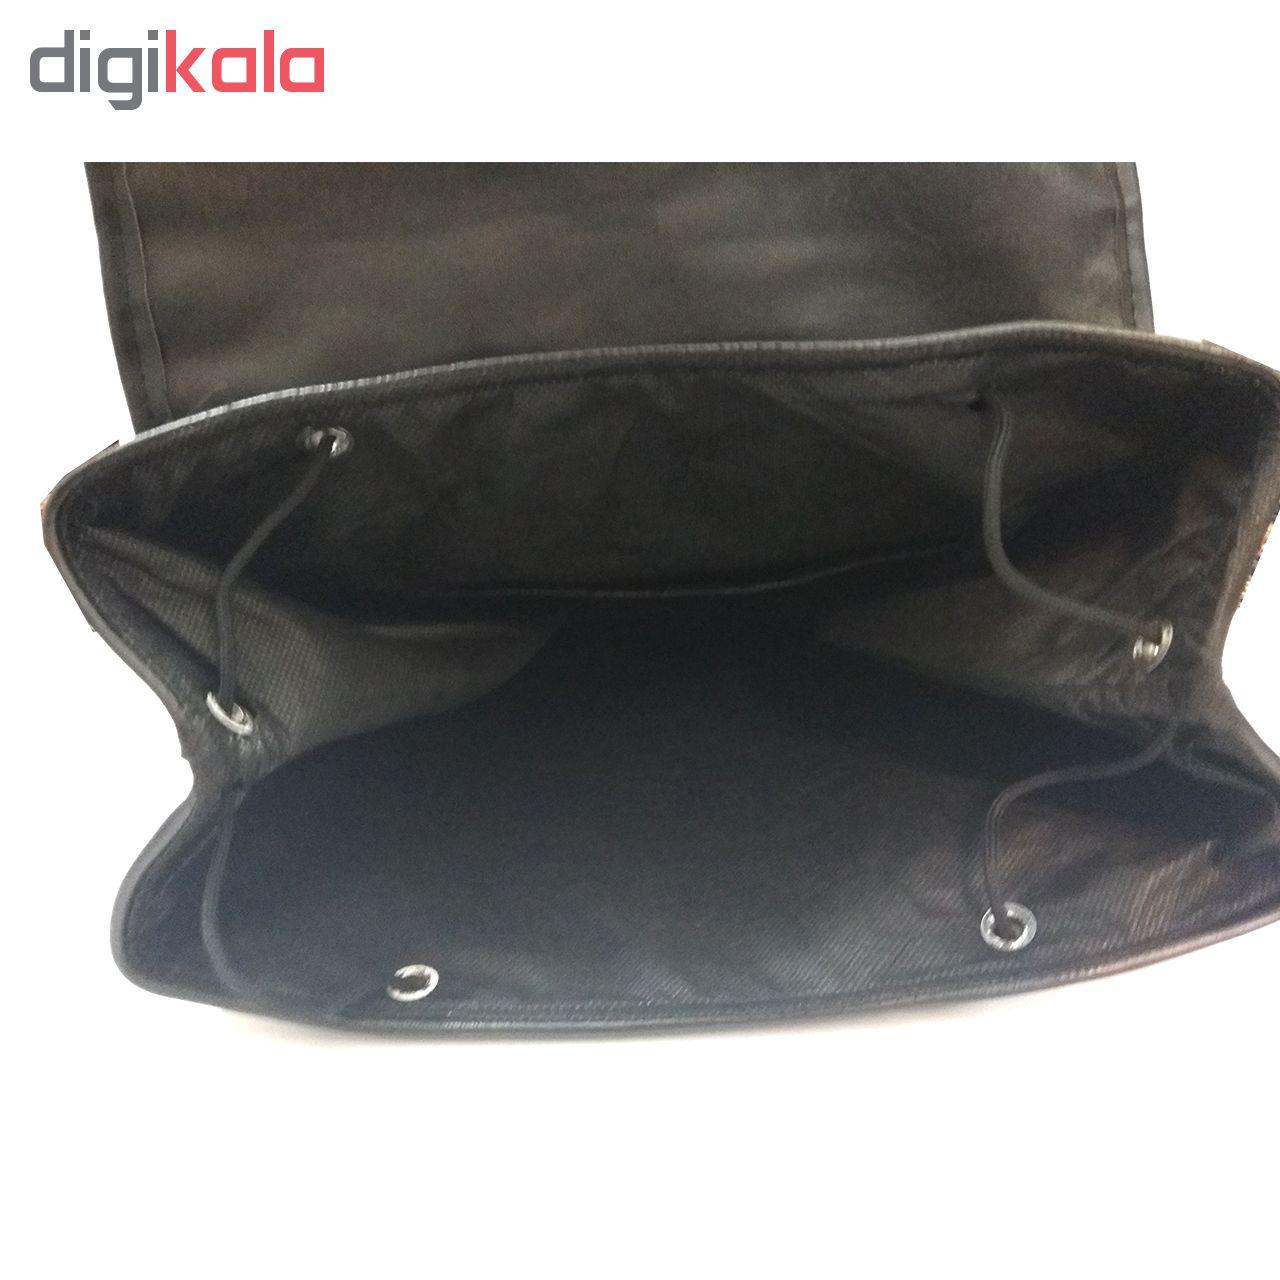 کوله پشتی دالاوین طرح دوربین کد K-6 -  - 5